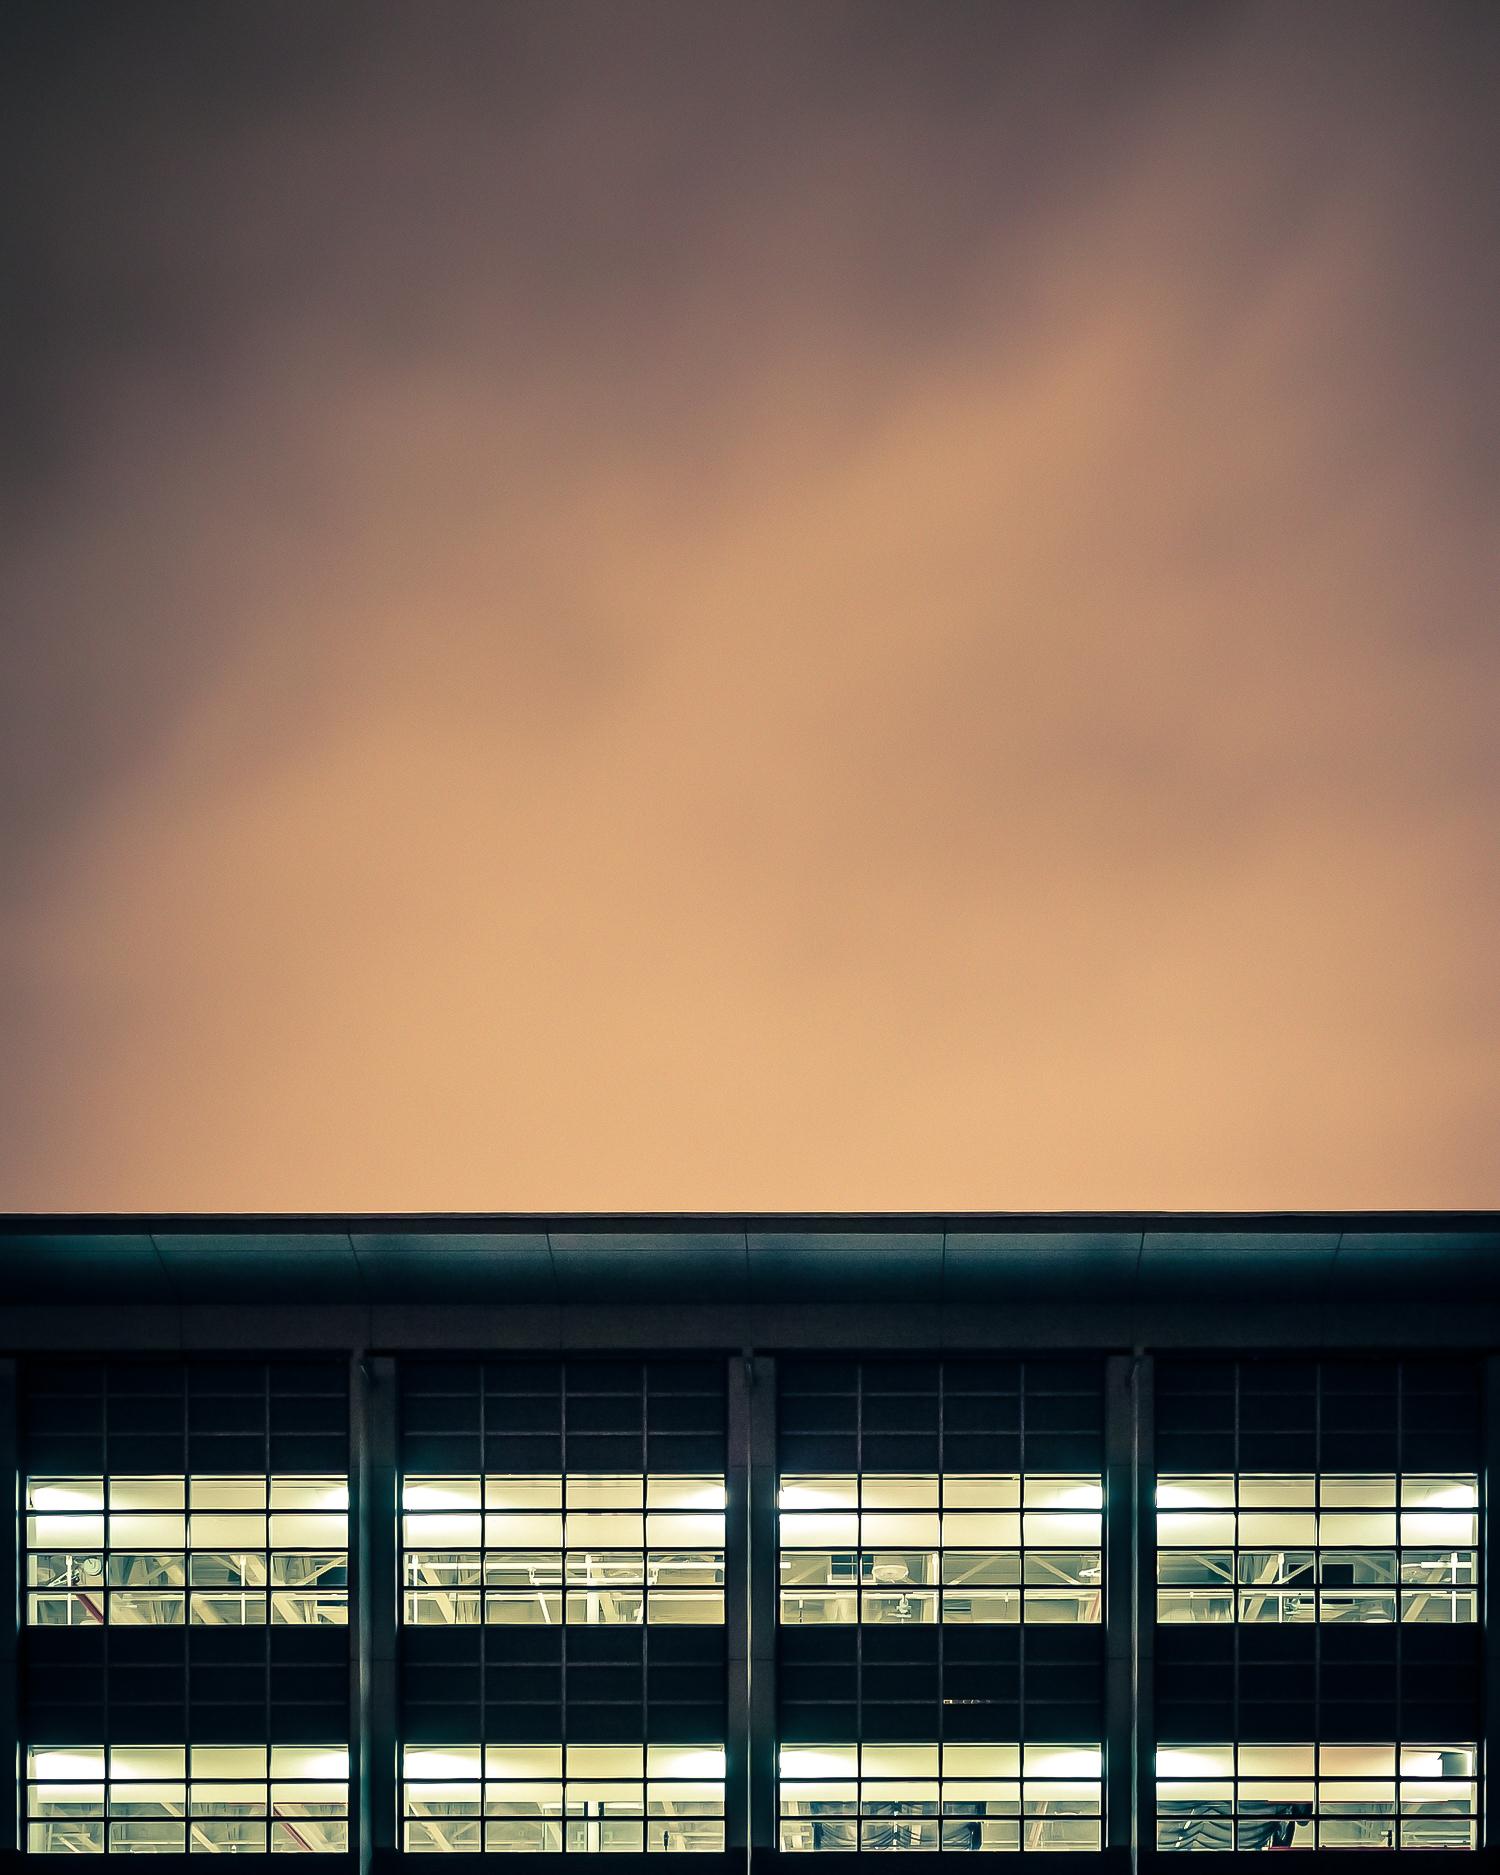 Brick_and_glass-Paul_Puiia-1.jpg